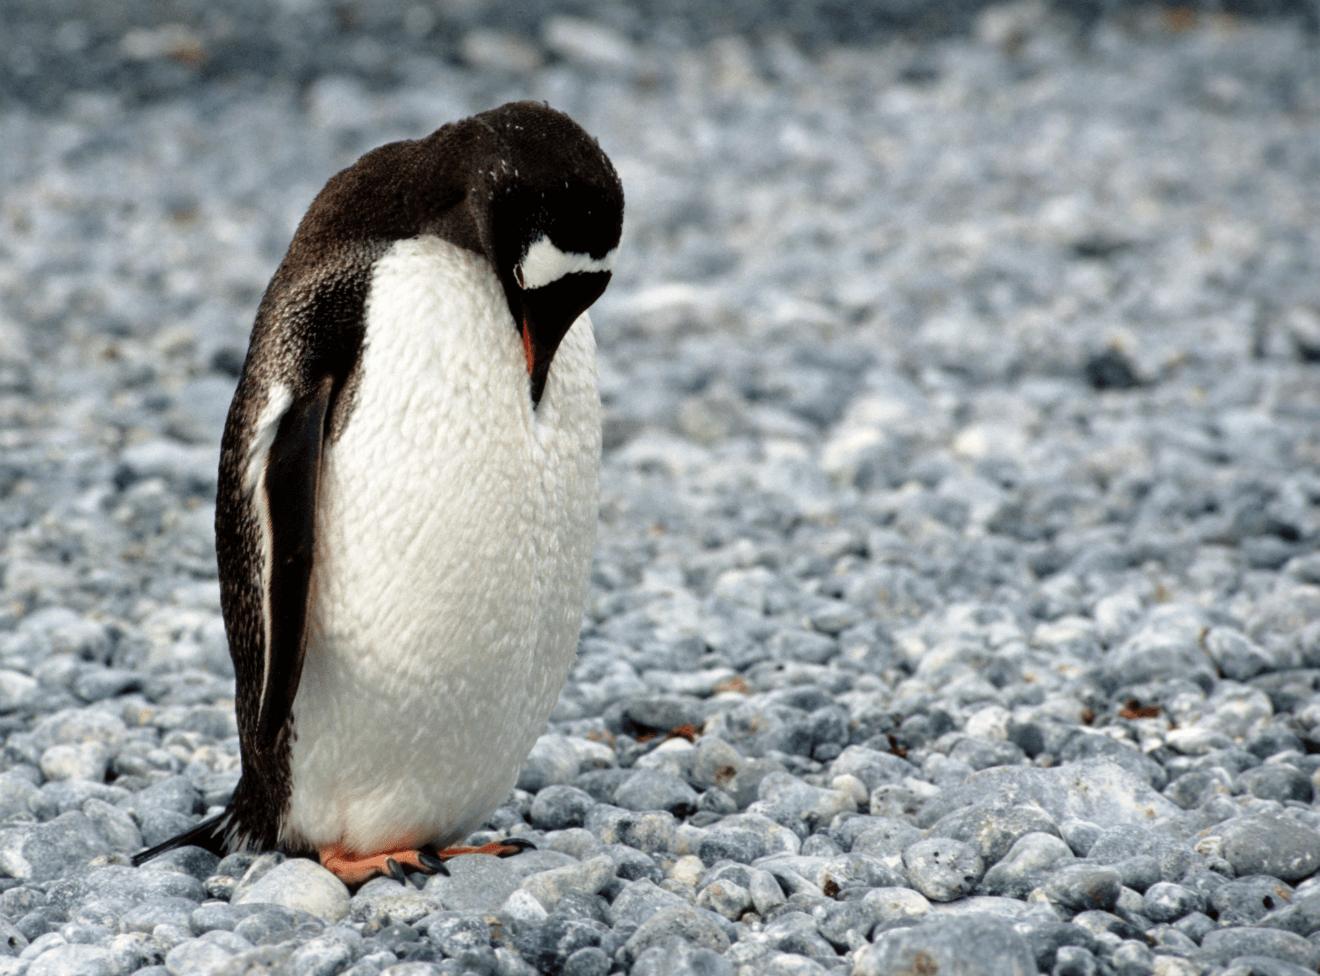 sad penguin alone looking down at feet